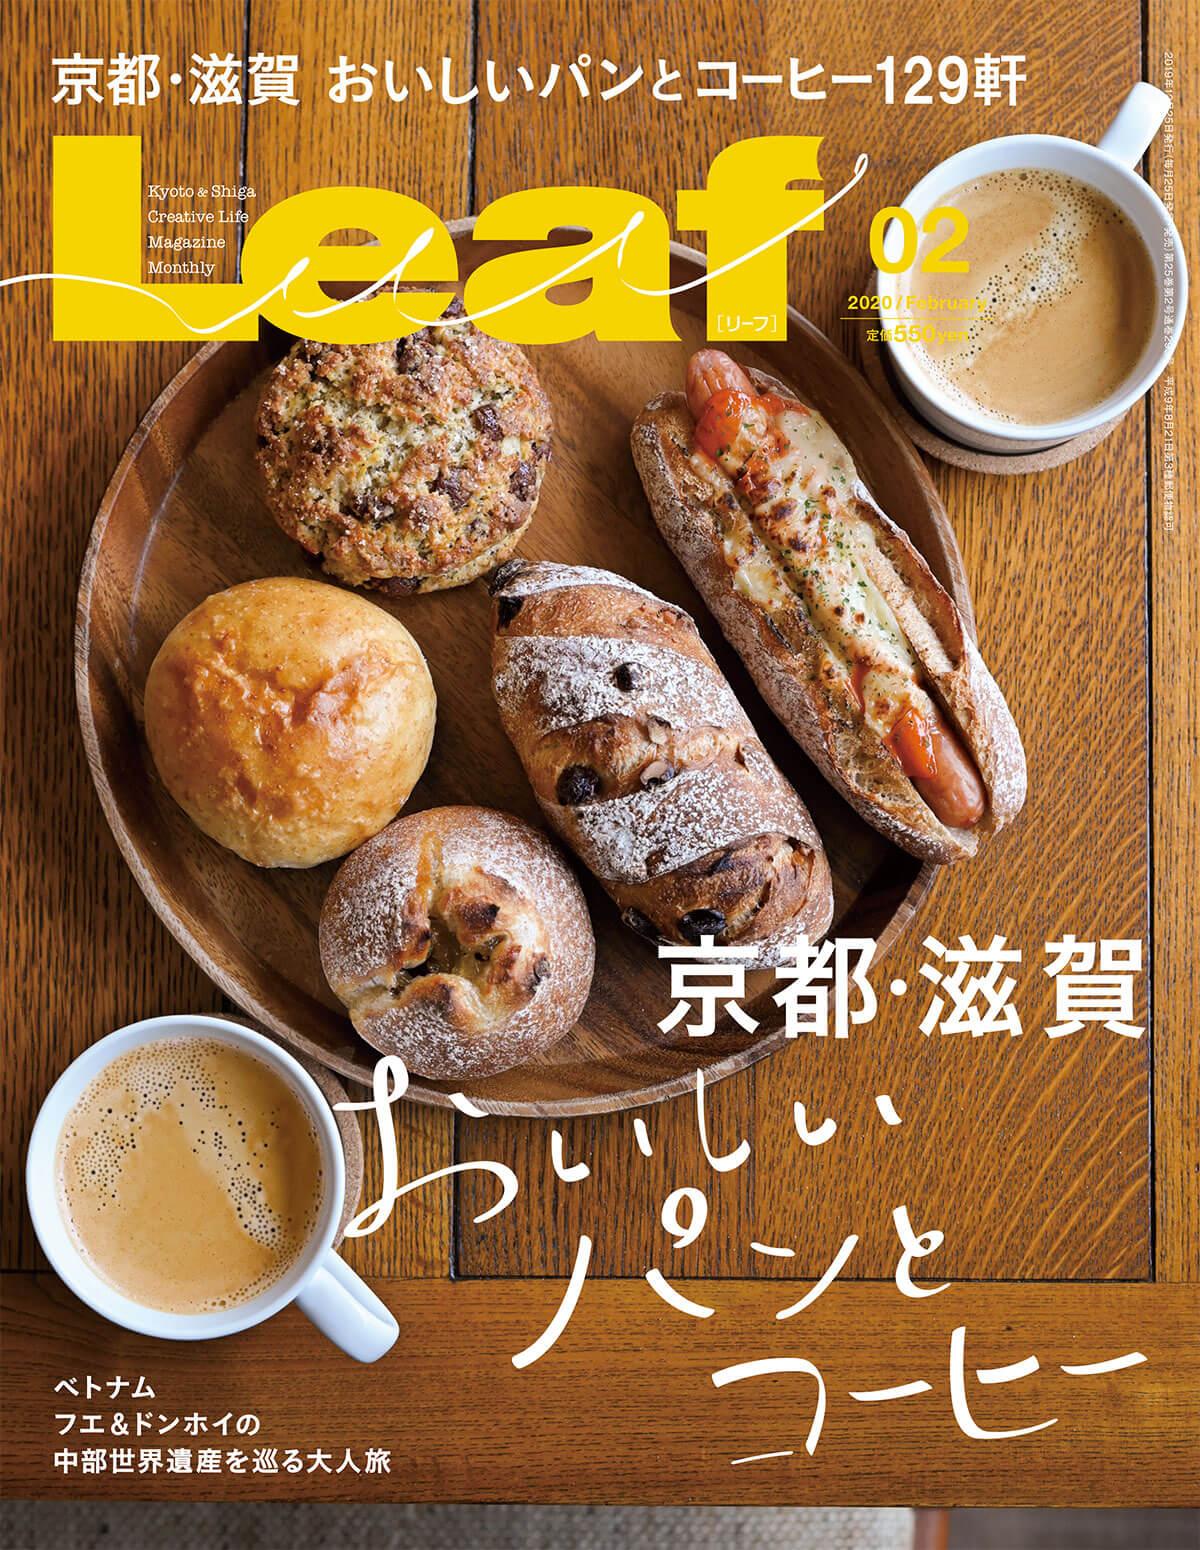 Leaf - 京都・滋賀 パンとコーヒー